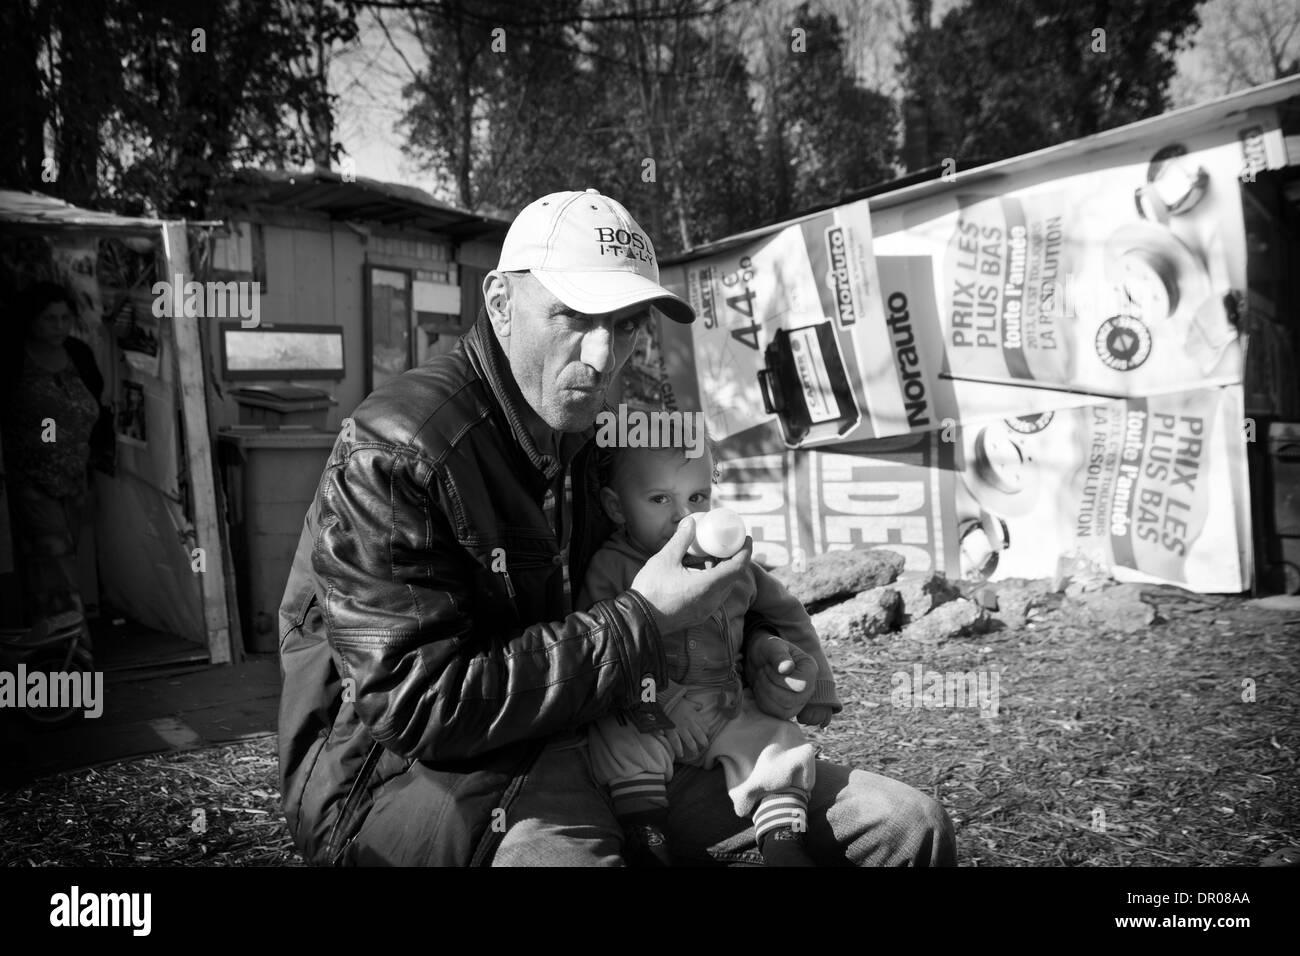 ROMANI CAMP - Stock Image